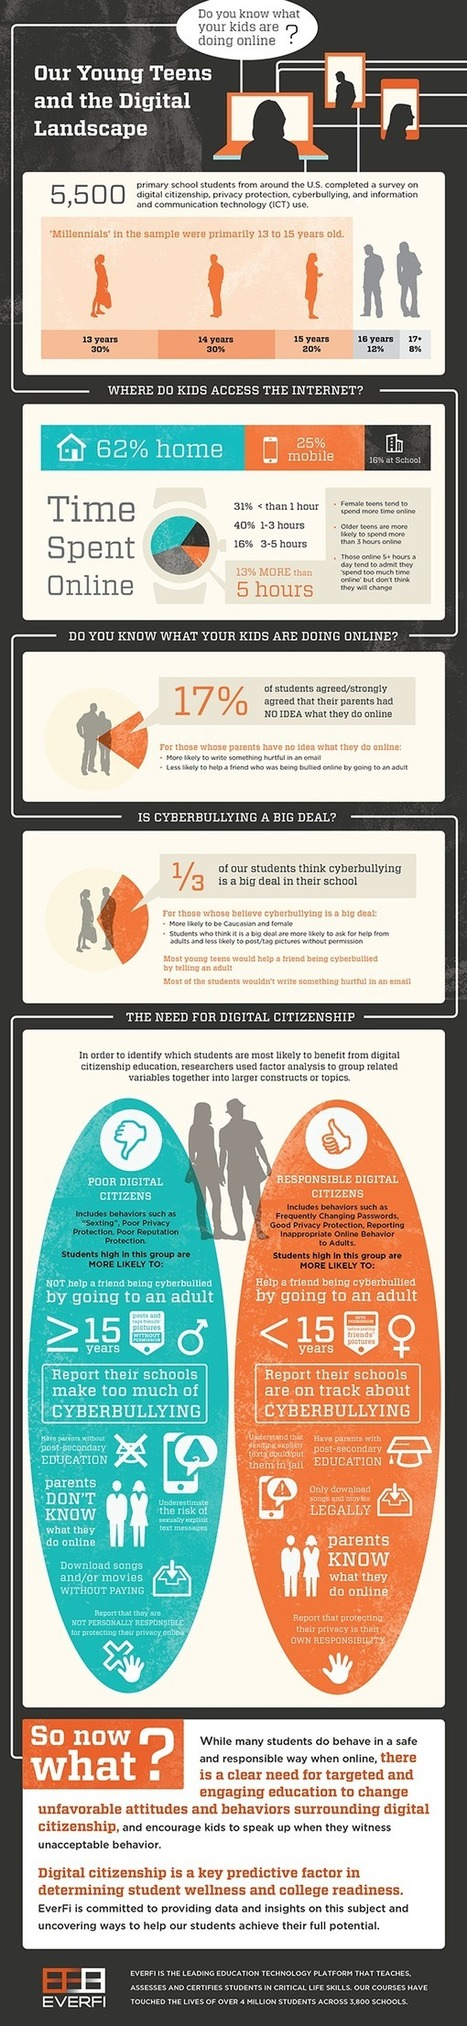 Case for Digital Citizenship - EverFi | School Libraries Create 21st Century Digital Citizens | Scoop.it